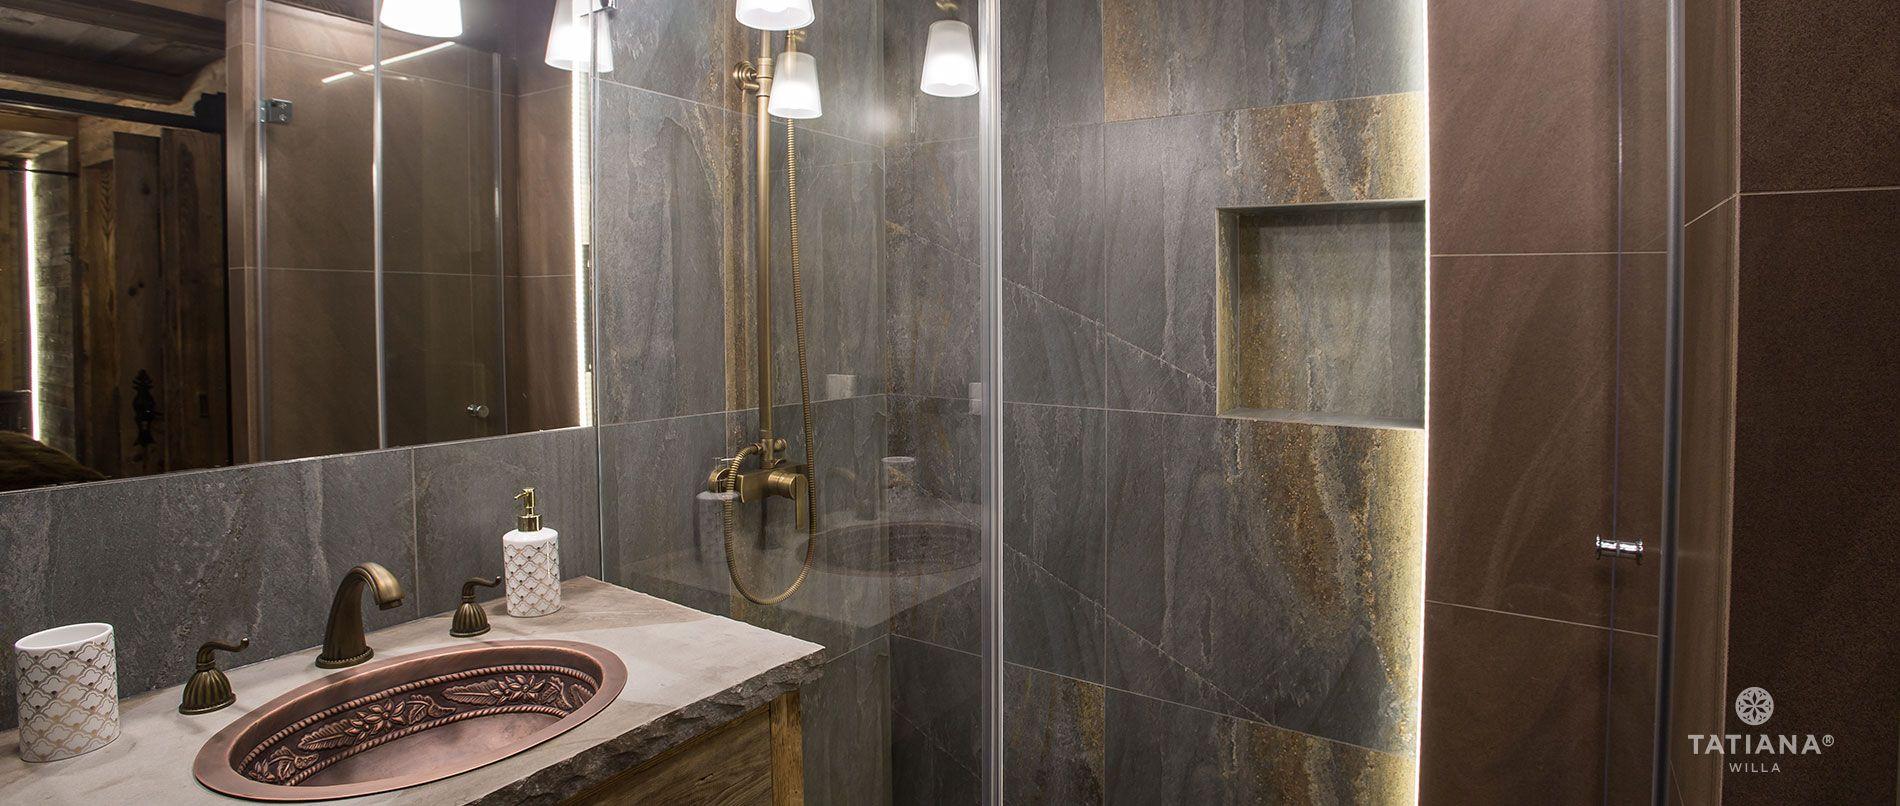 Apartament Karpacki - druga łazienka